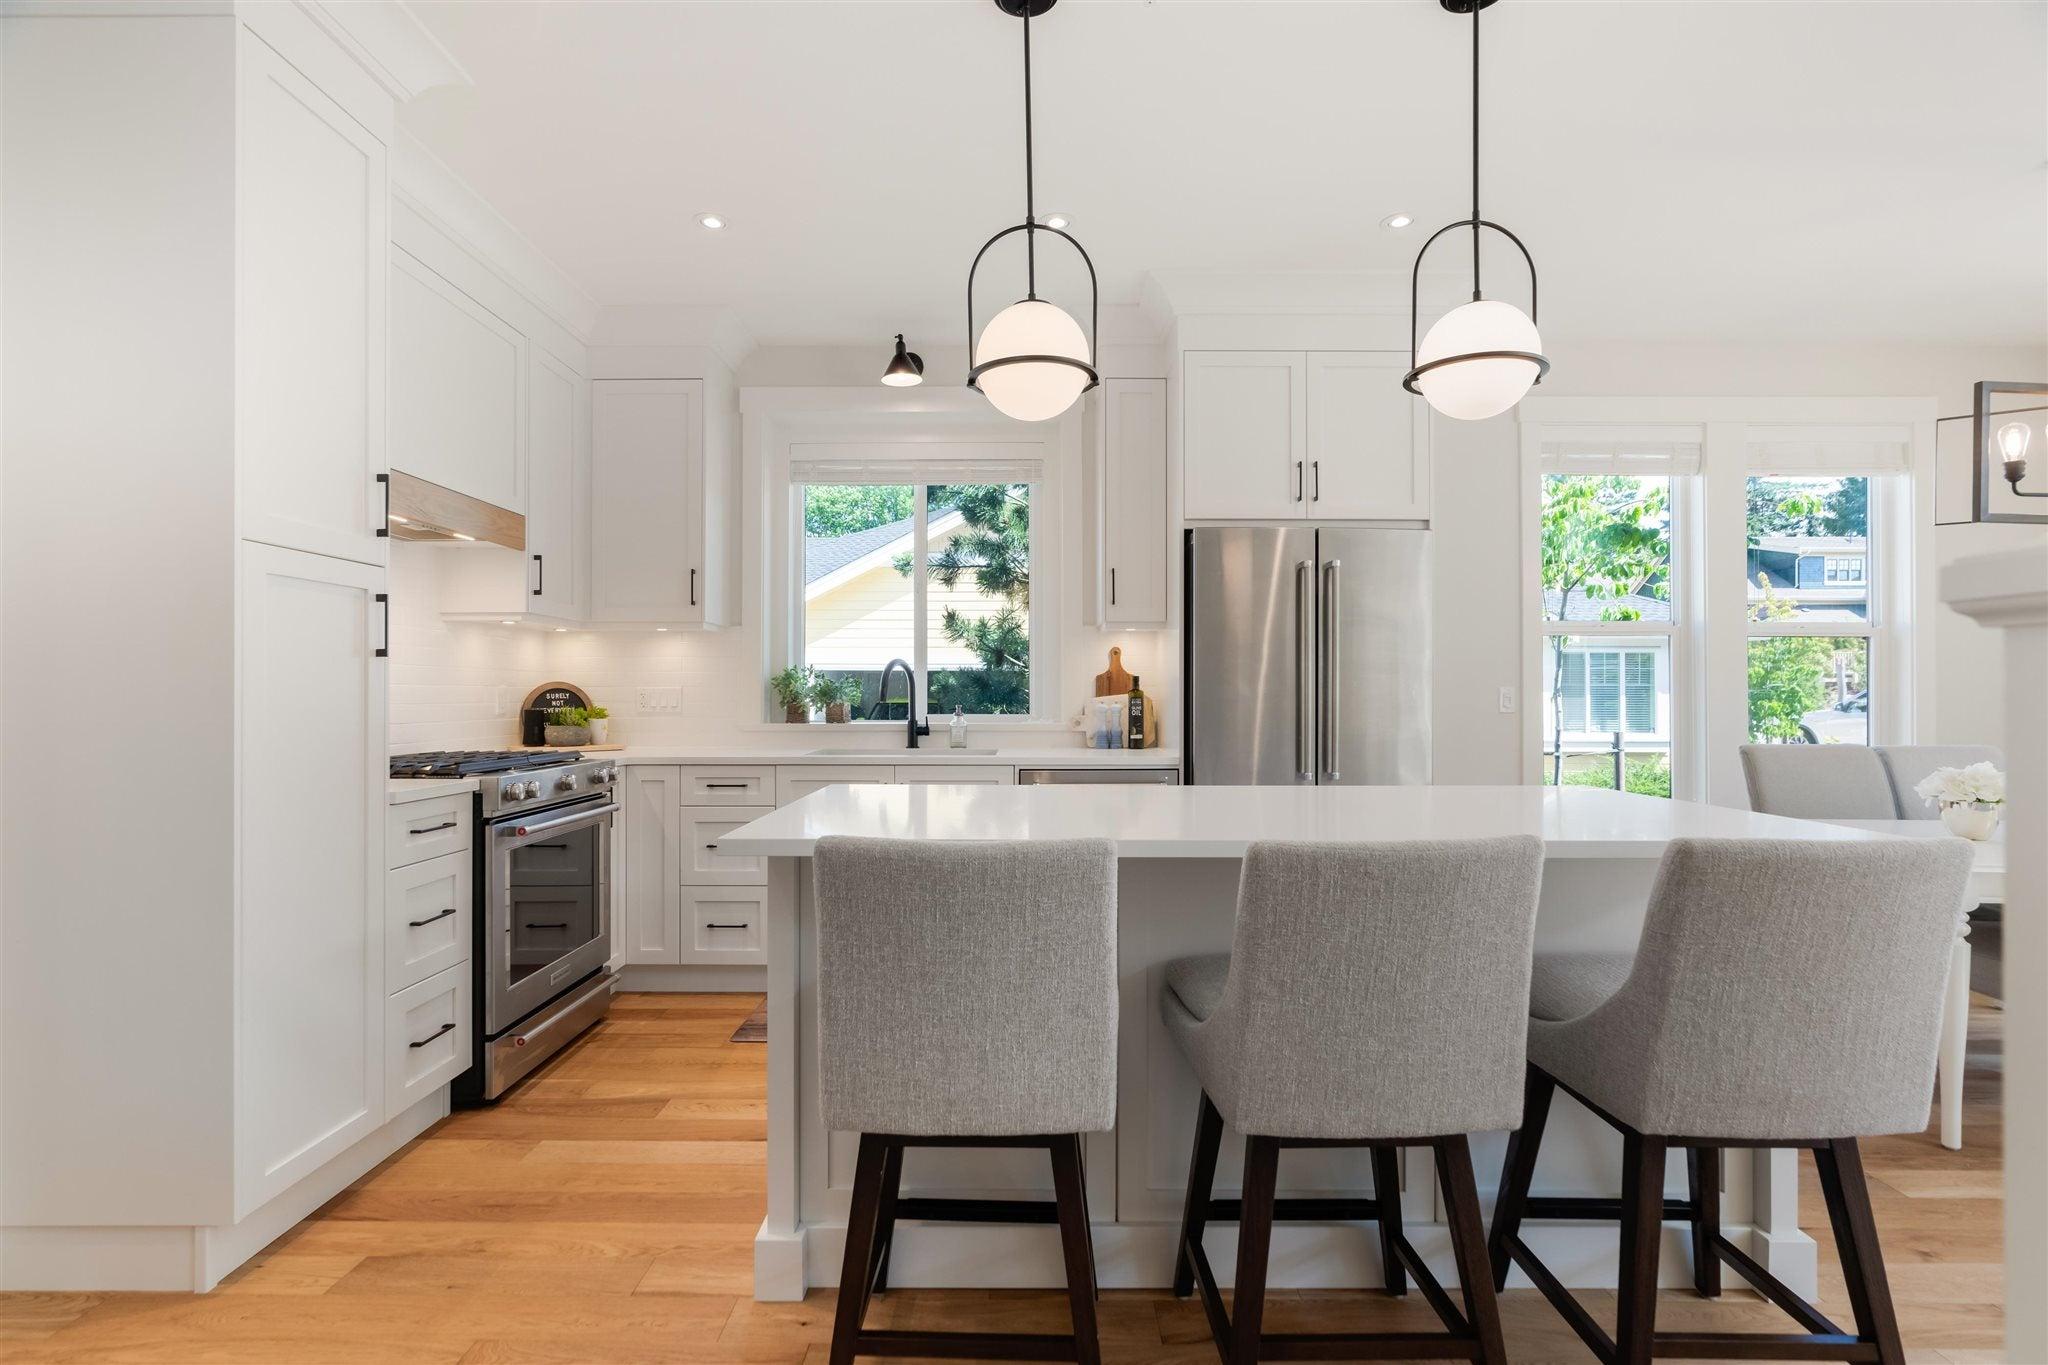 40 21858 47B AVENUE - Murrayville Townhouse for sale, 4 Bedrooms (R2603956) - #8